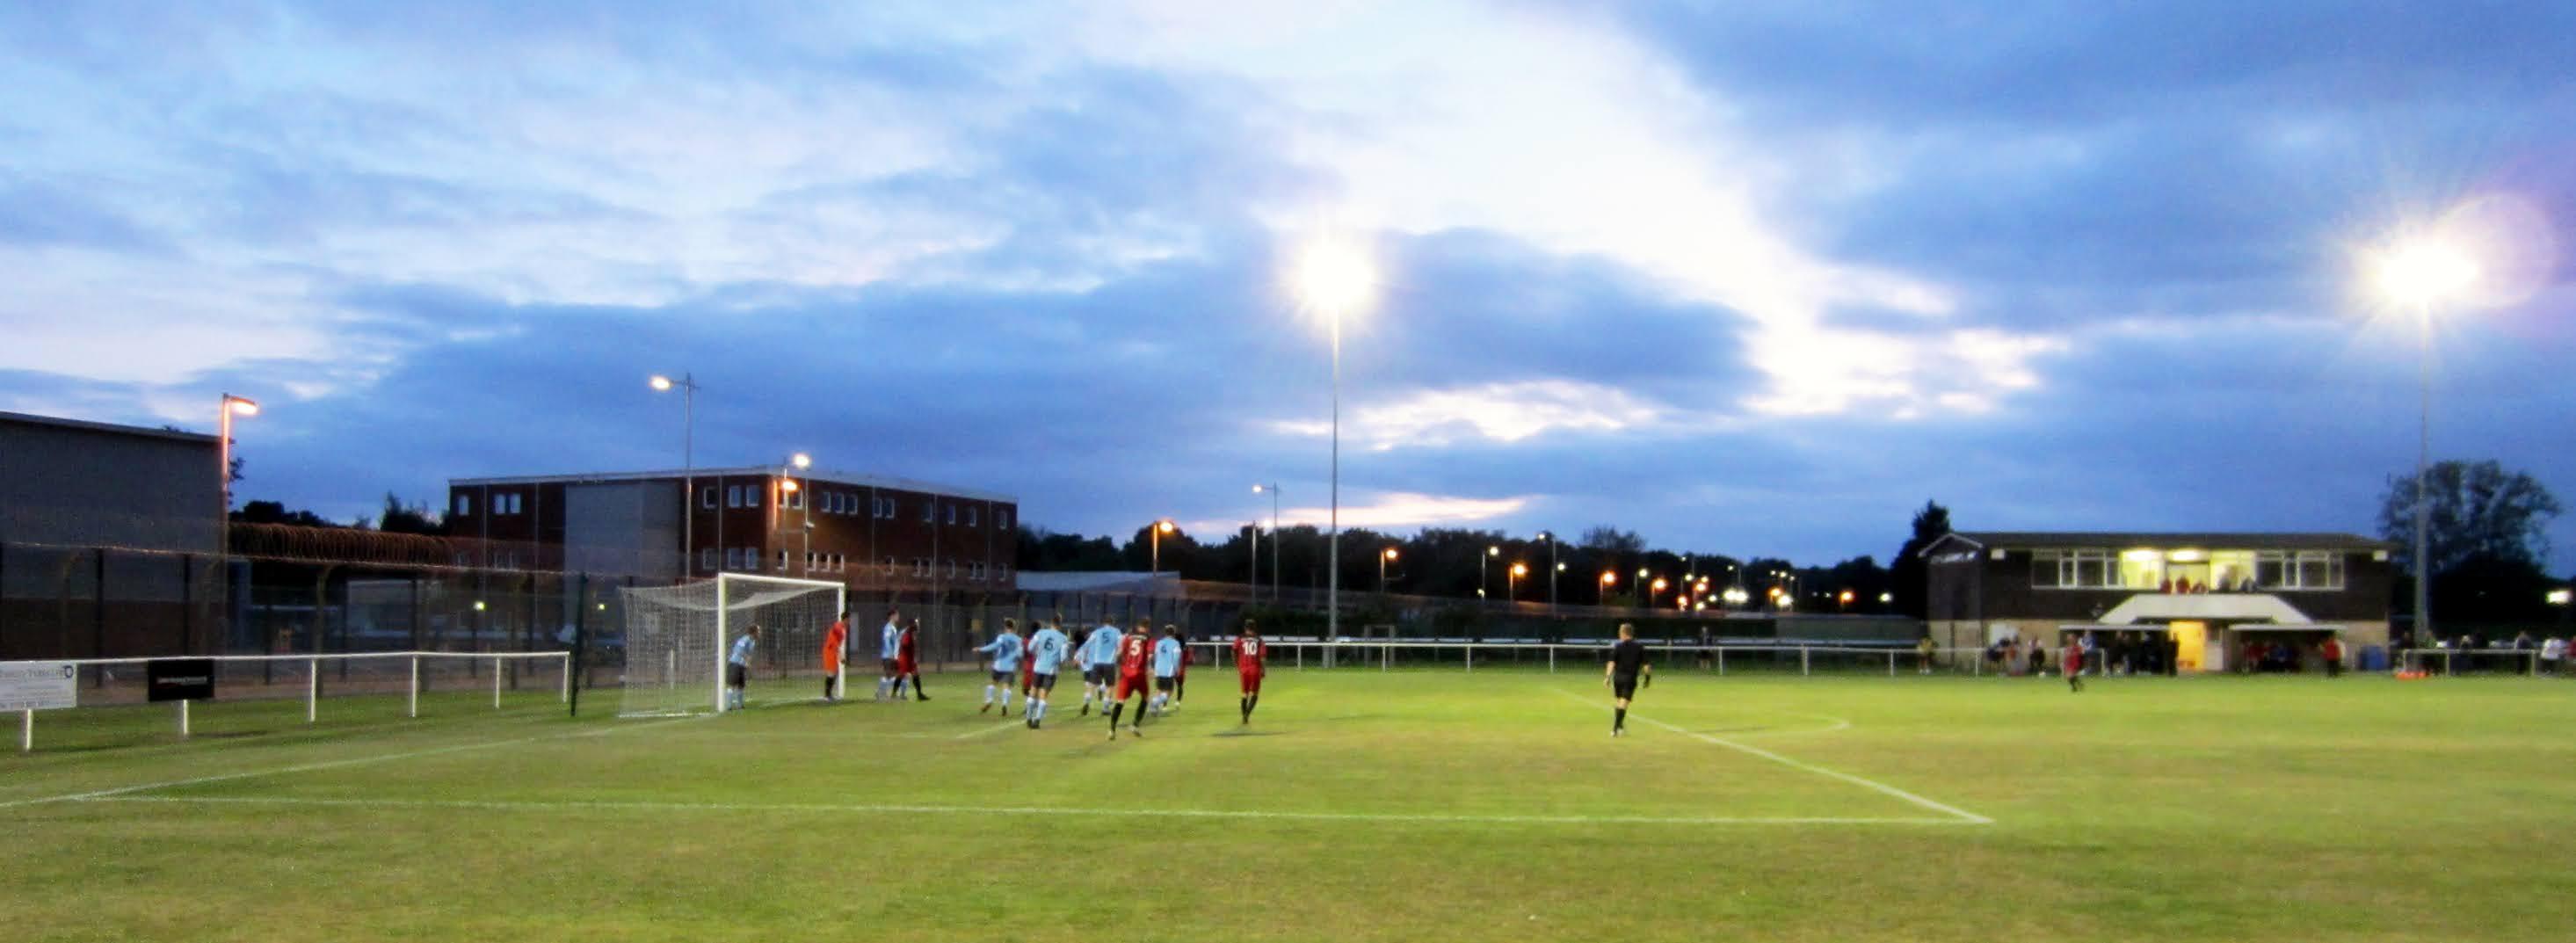 AFC Aldermaston player takes a corner kick against Woodley United